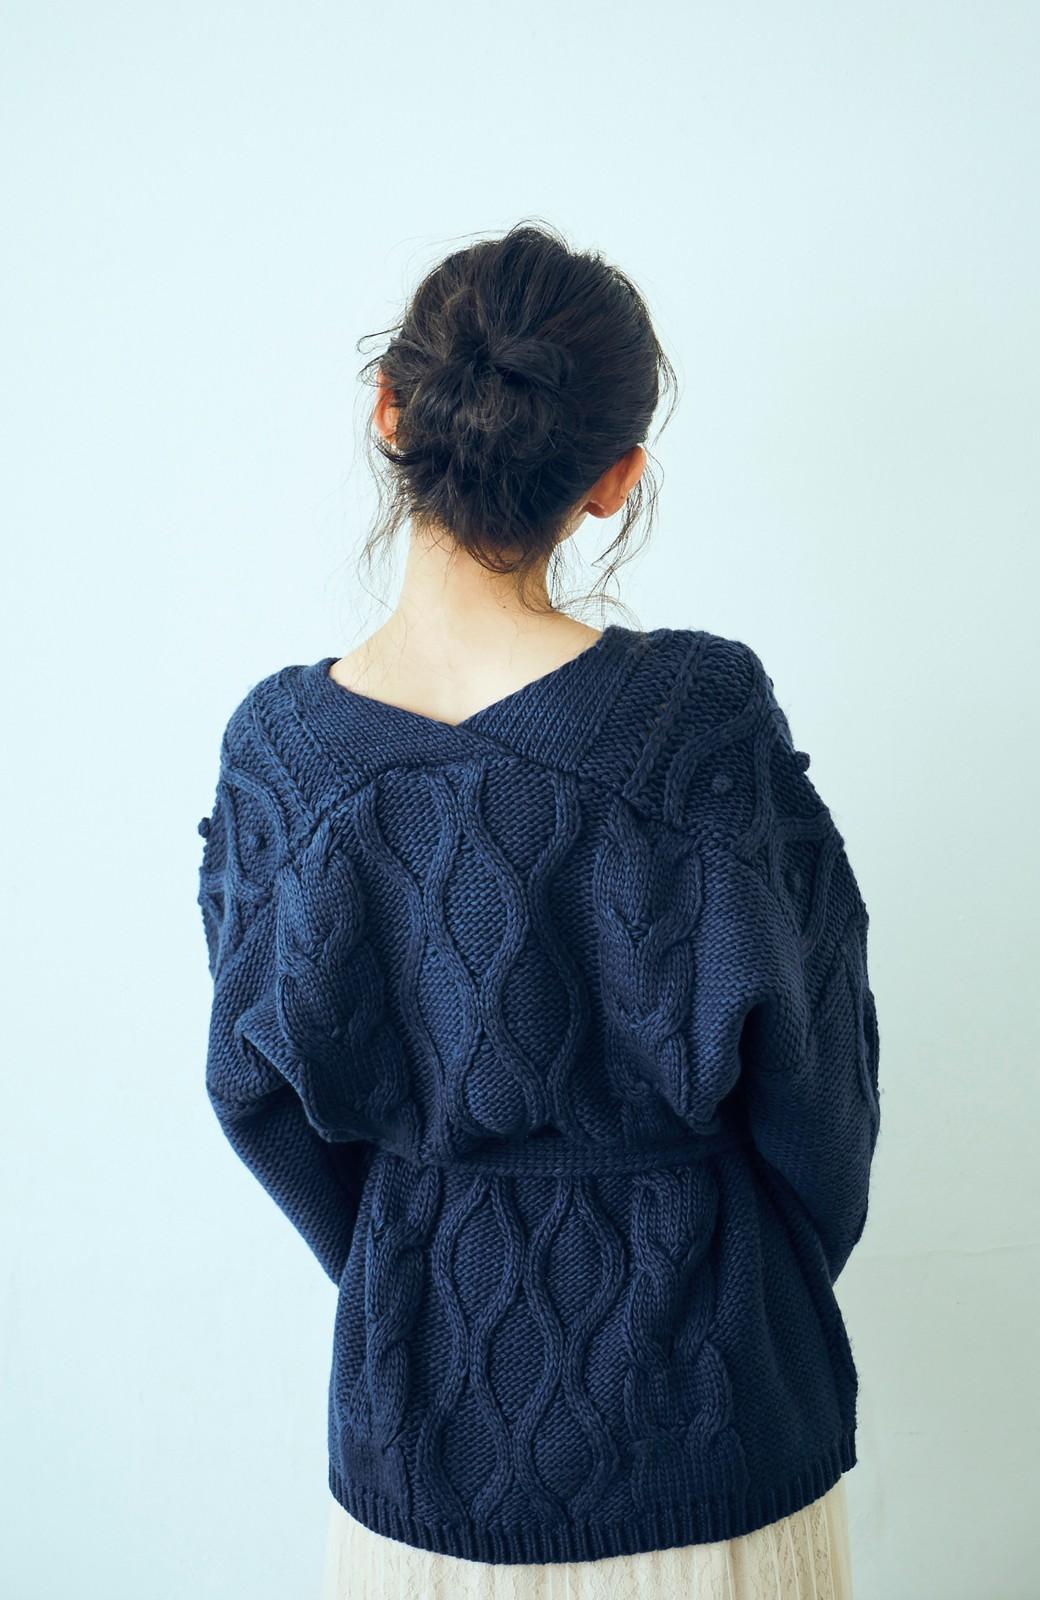 haco! <高橋愛さんコラボ>ラブ&ピースプロジェクト パプコーン編みのウエストマークケーブルニットトップス <ネイビー>の商品写真8